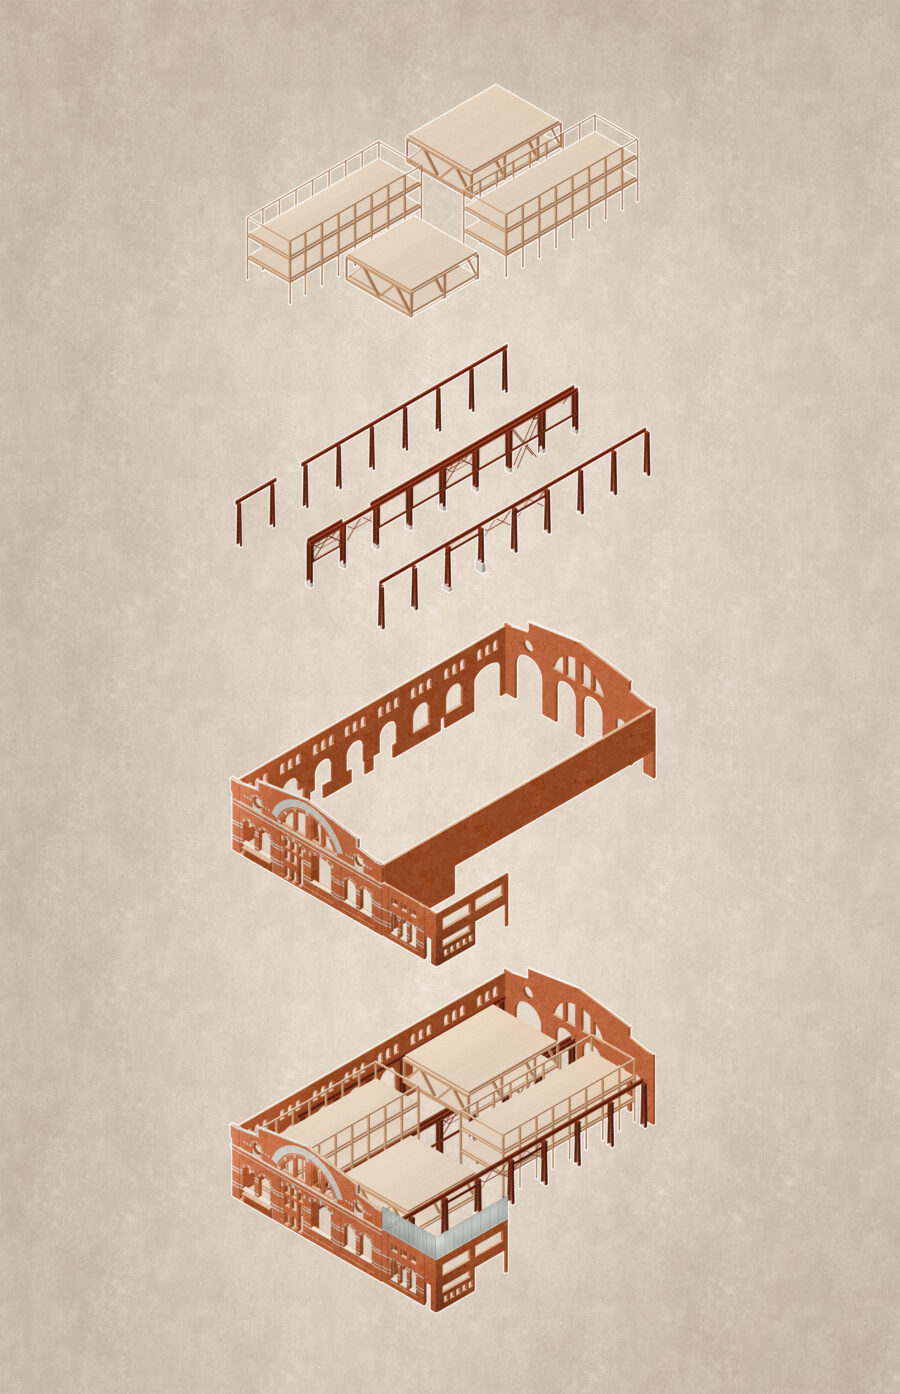 KjellanderSjoberg Gjuteriet Concept Diagram 05 3600x2324px